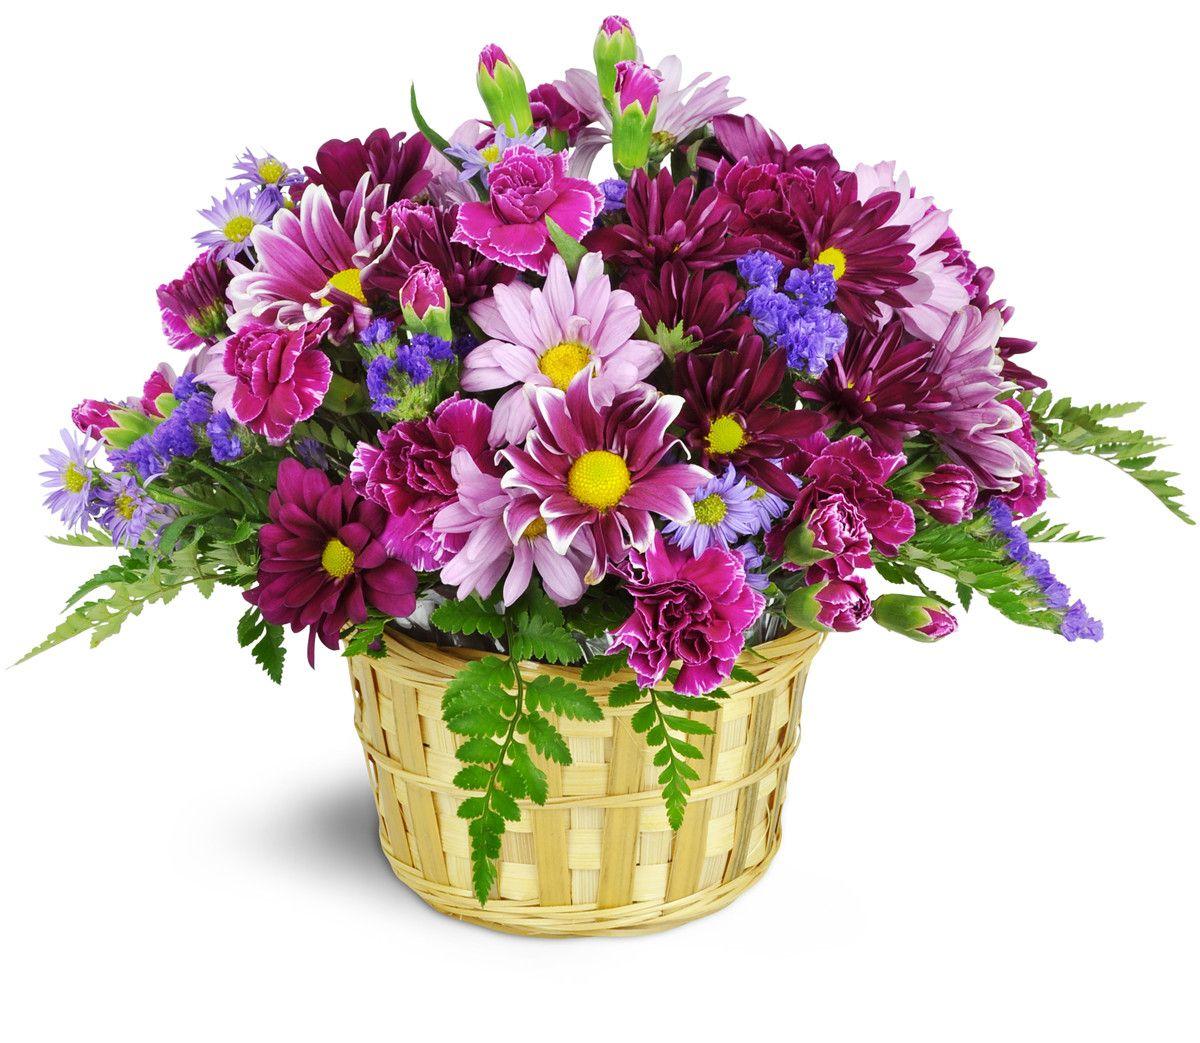 Amethyst Skies Basket™ Flower delivery, Outdoor floral